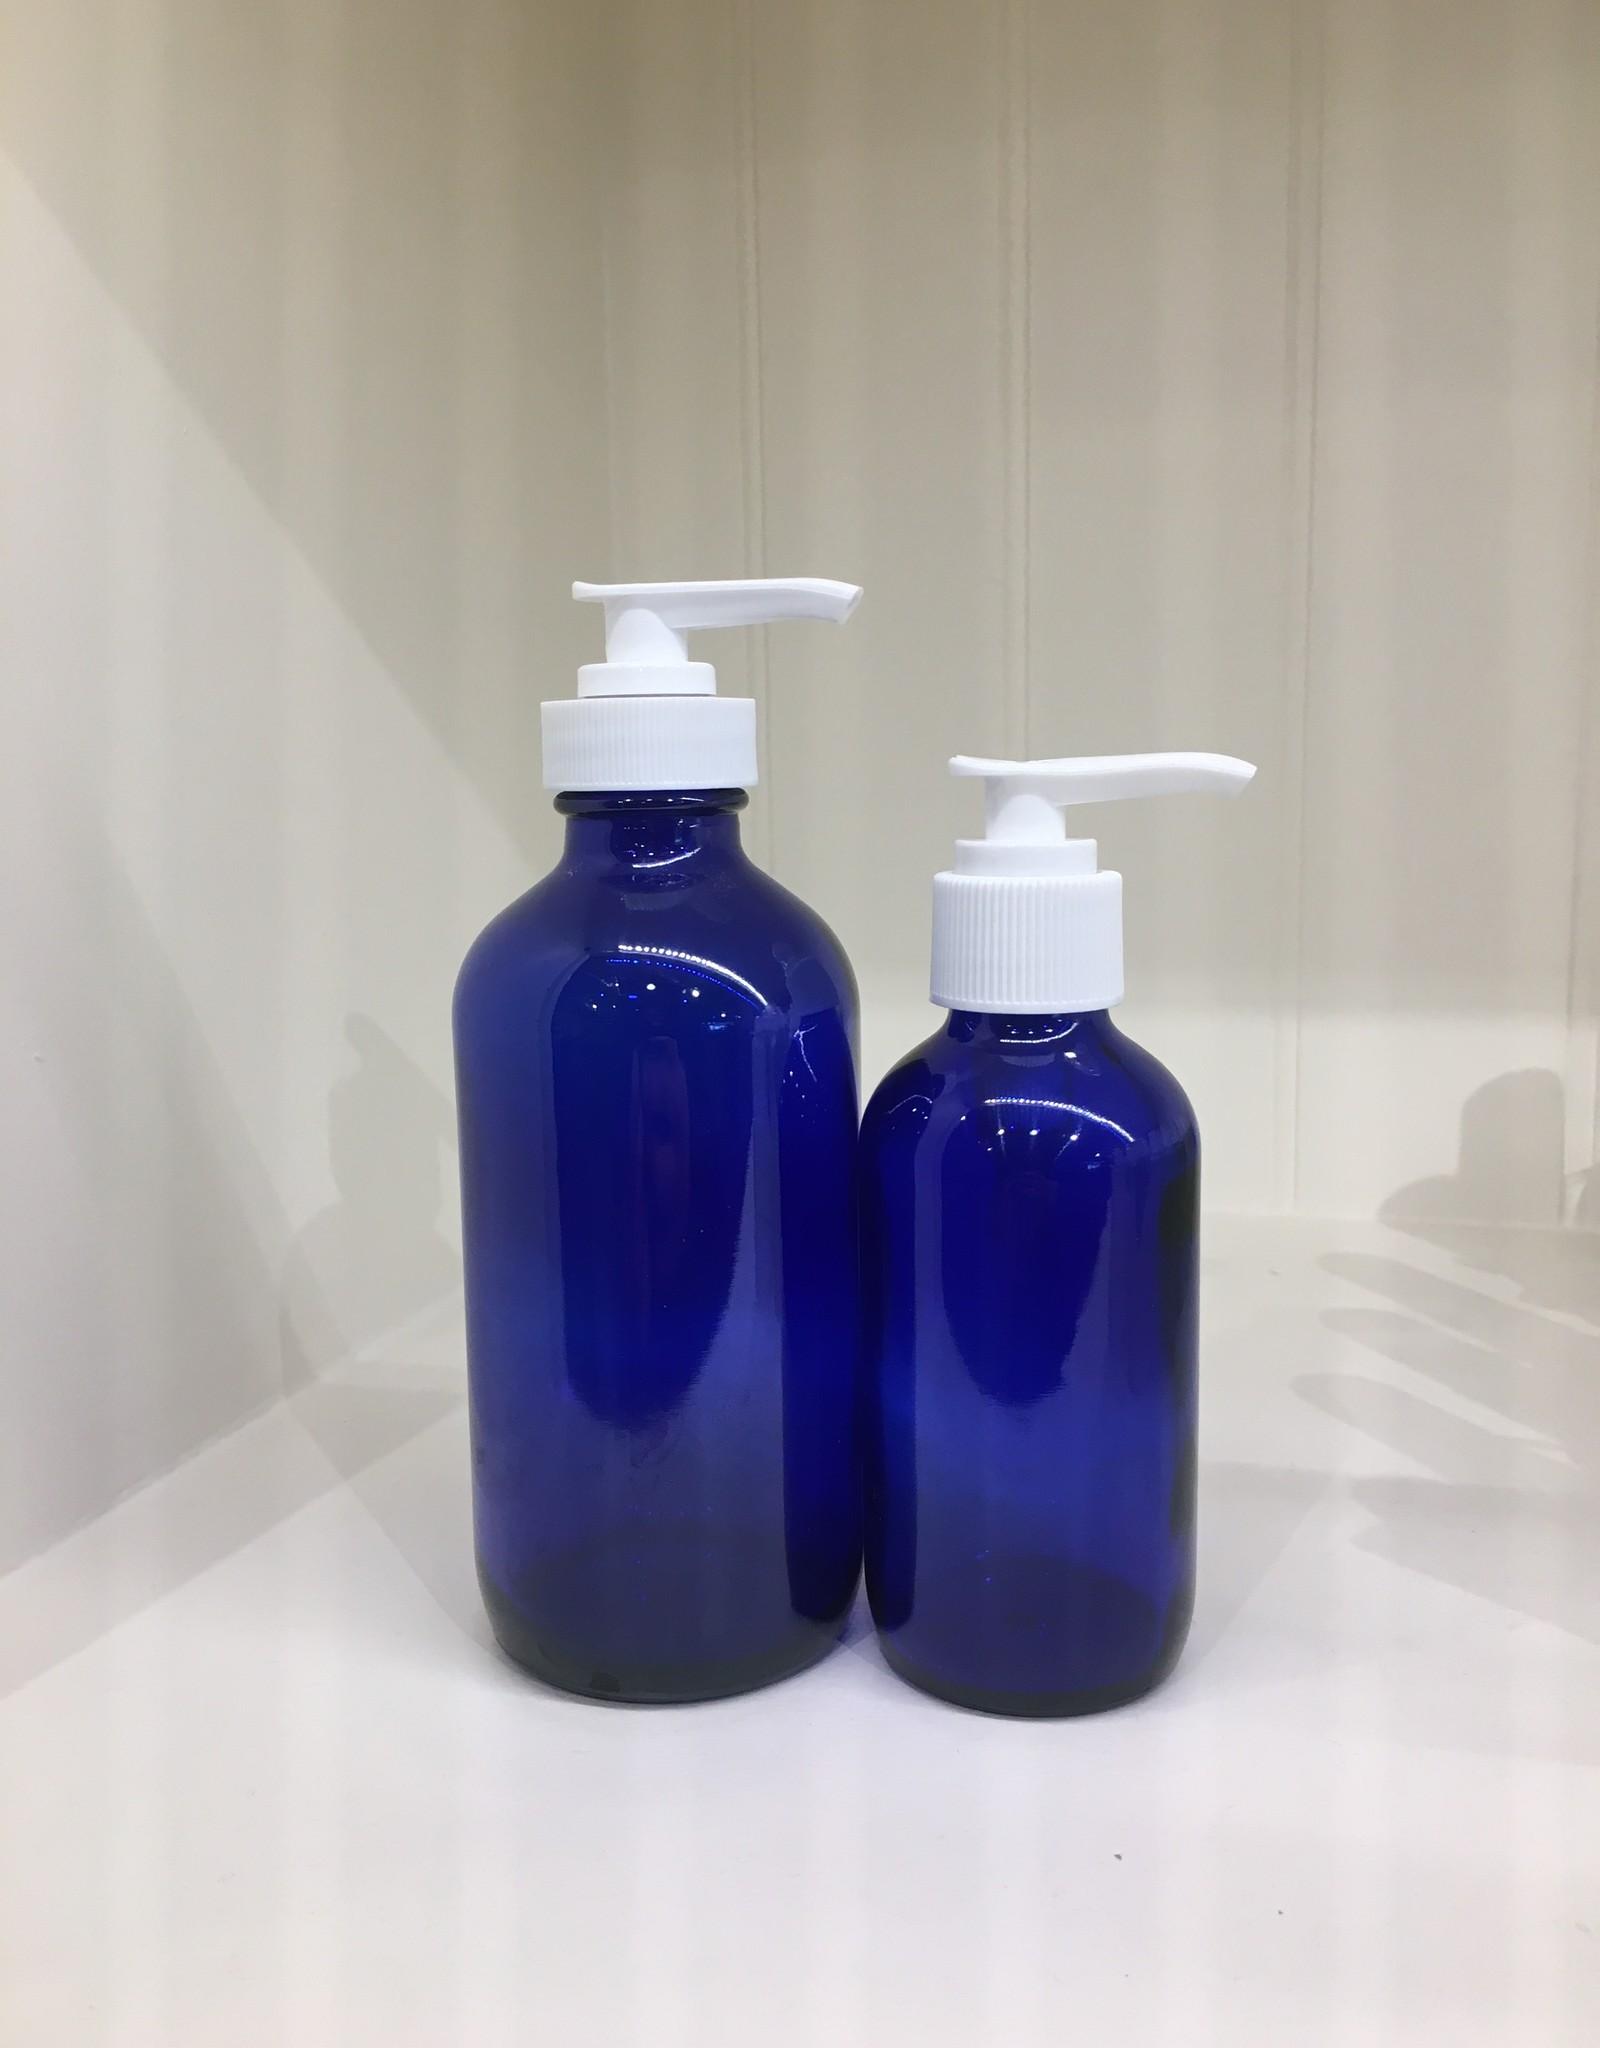 Bulk Calendula Body Lotion in Glass Bottle